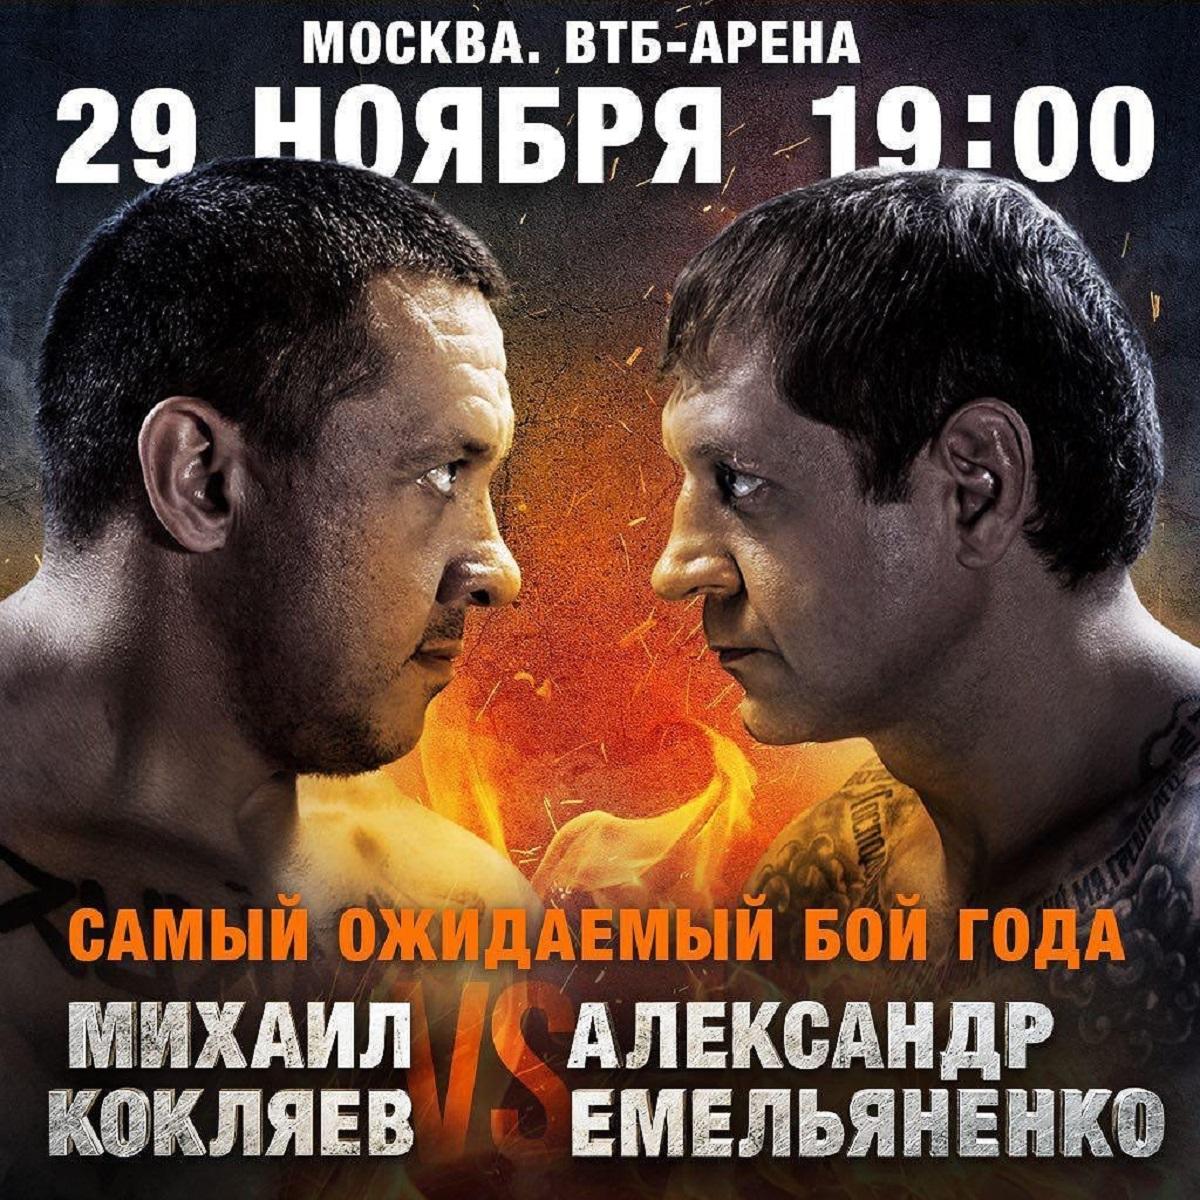 Александр Емельяненко - Михаил Кокляев - Alexander Emelianenko vs Mihail Kokliaev